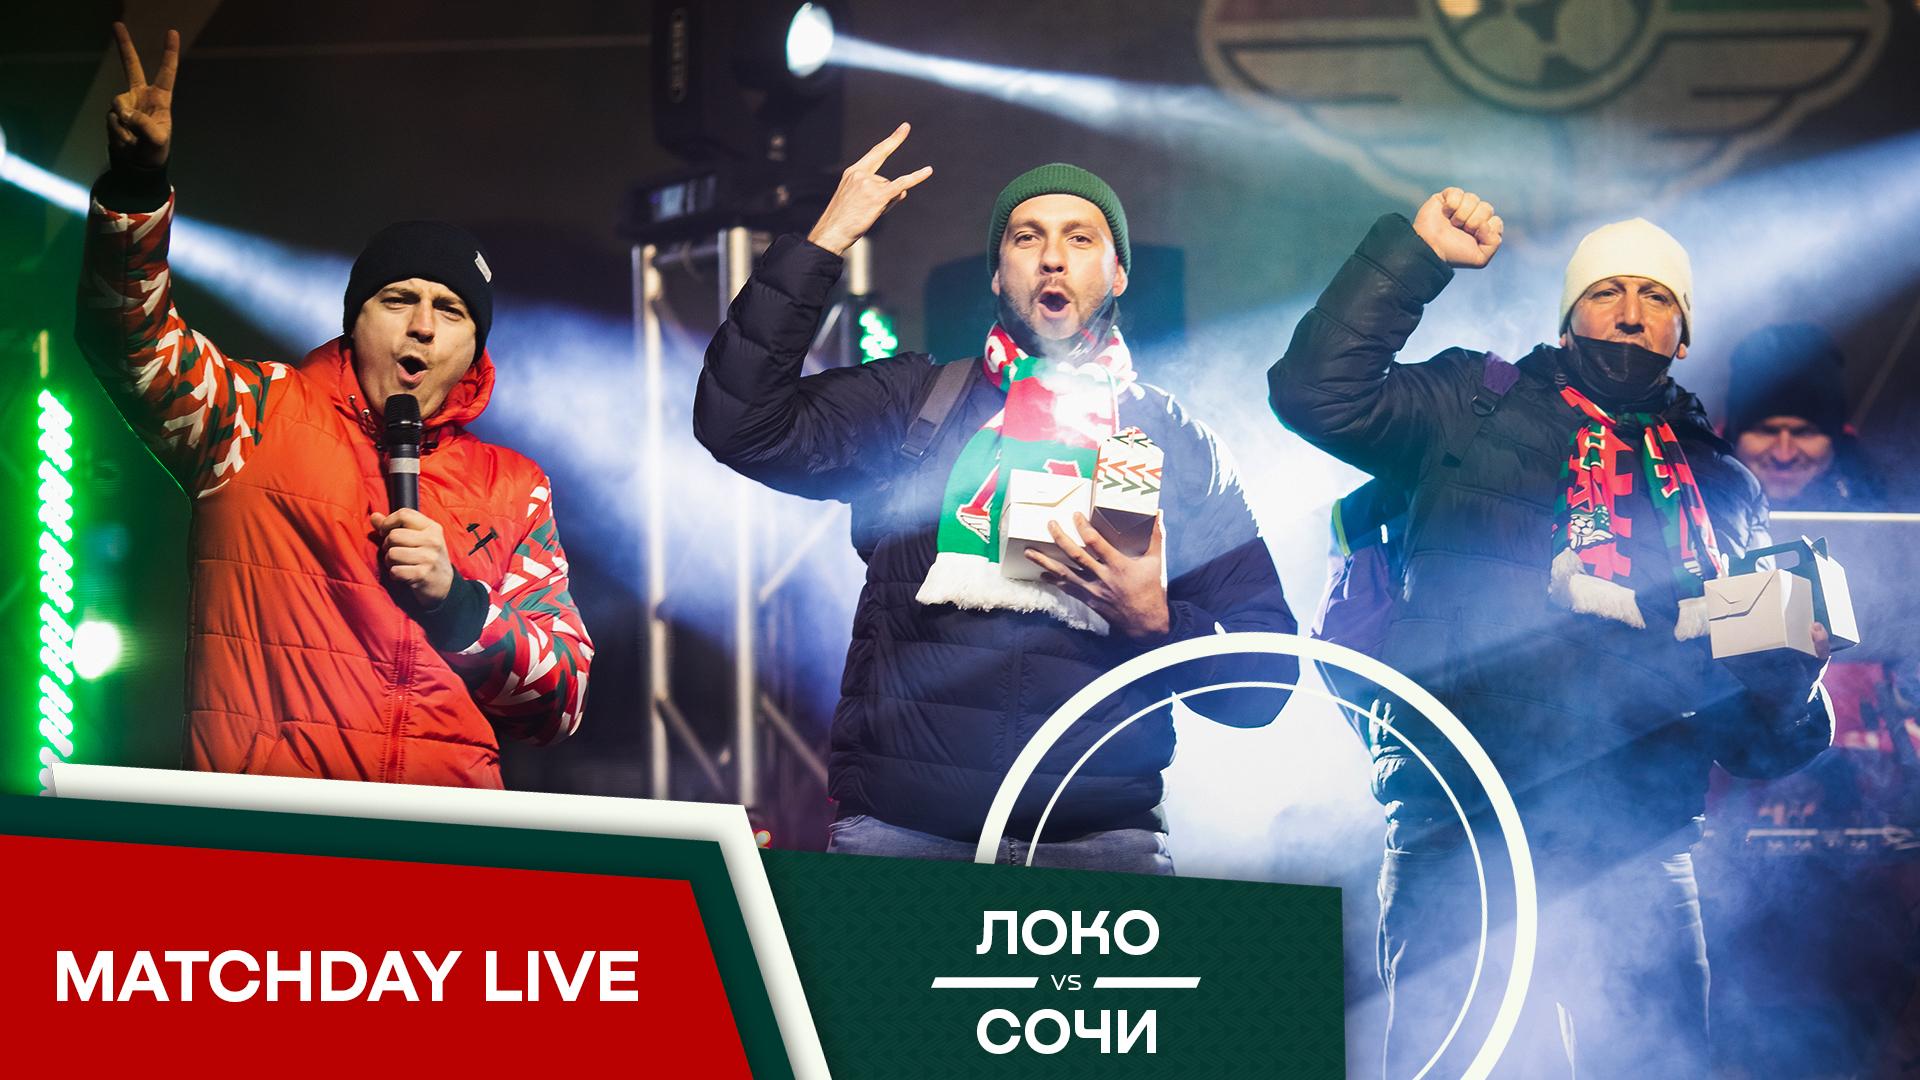 MATCHDAY LIVE // «Локомотив» – «Сочи» // 25.10.2021